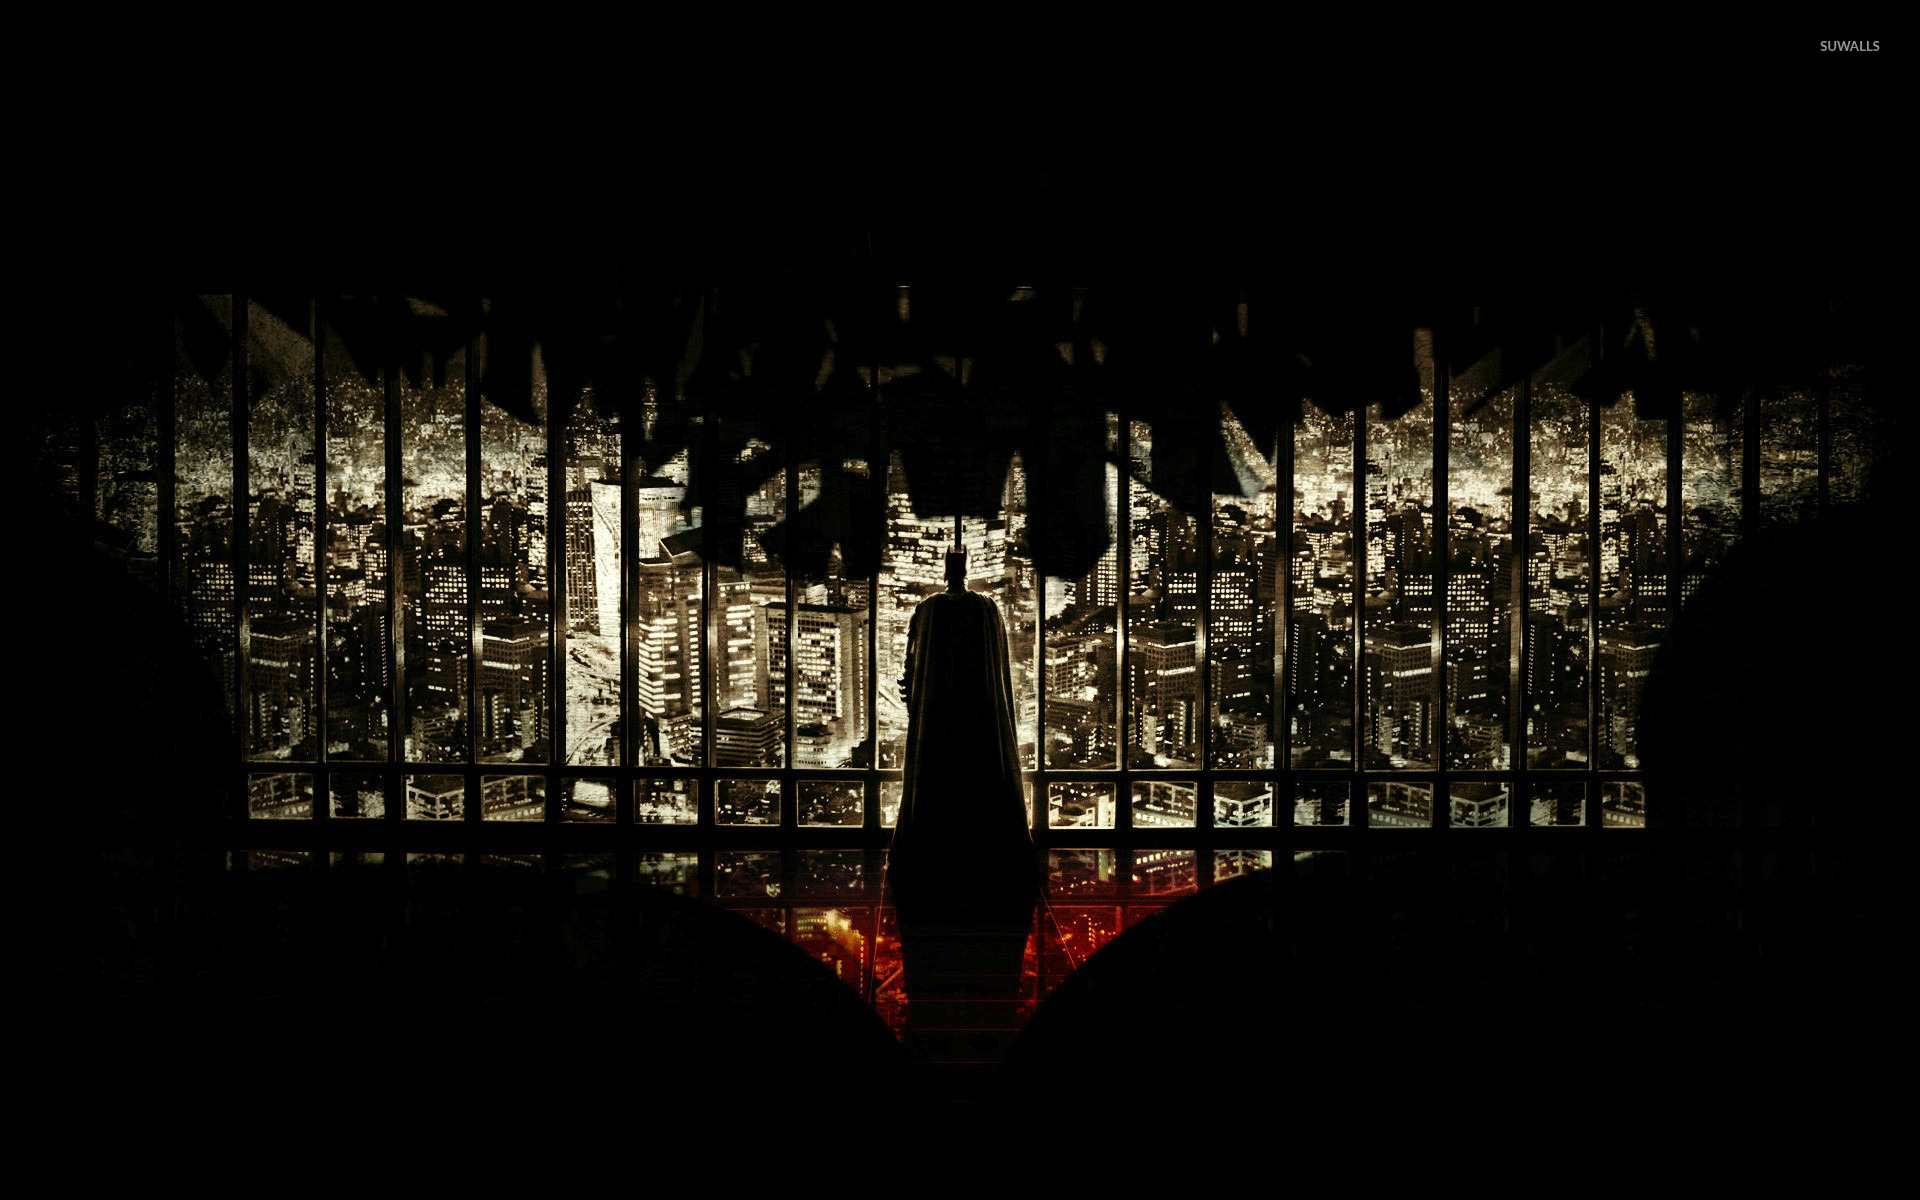 Batman The Dark Knight Rises 2 Wallpaper Movie